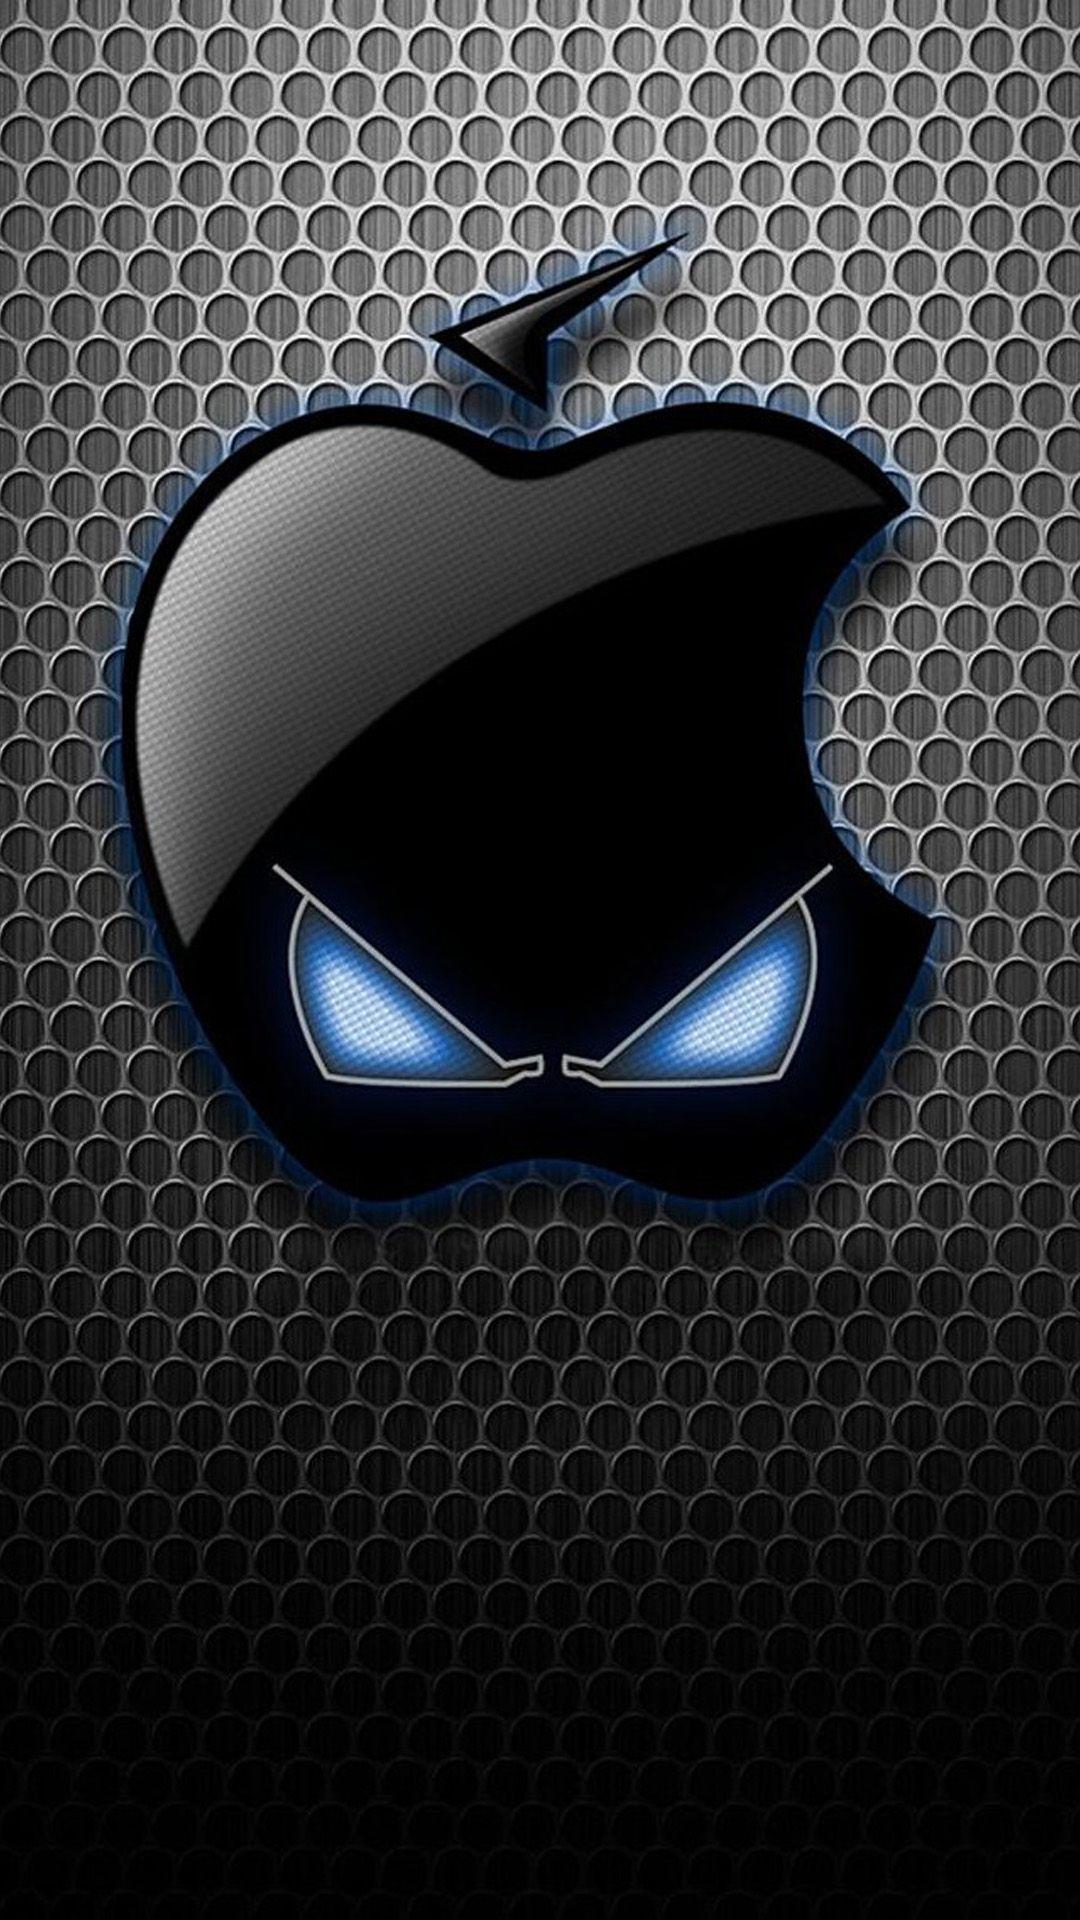 Free Themes For All Freeringtonesfor Com Apple Logo Wallpaper Iphone Apple Wallpaper Apple Wallpaper Iphone